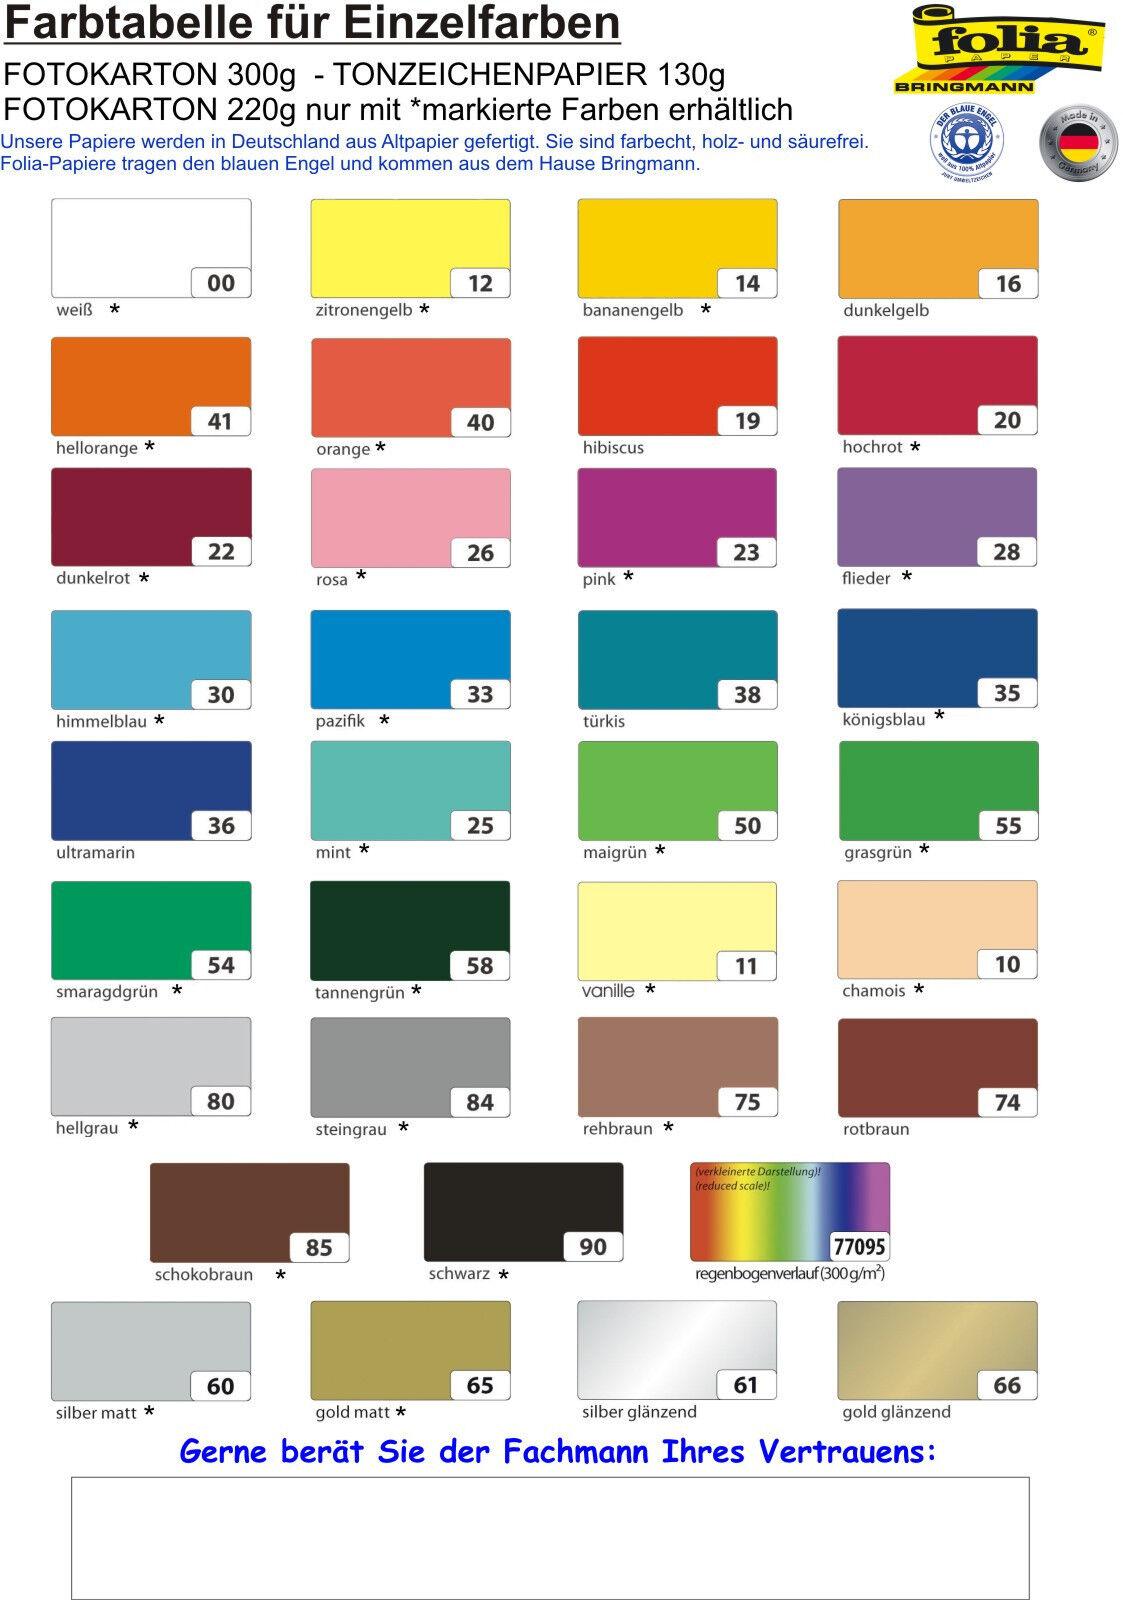 Tonpapier - Tonzeichenpapier Papier basteln 130g DIN A4 100 Blatt UNI